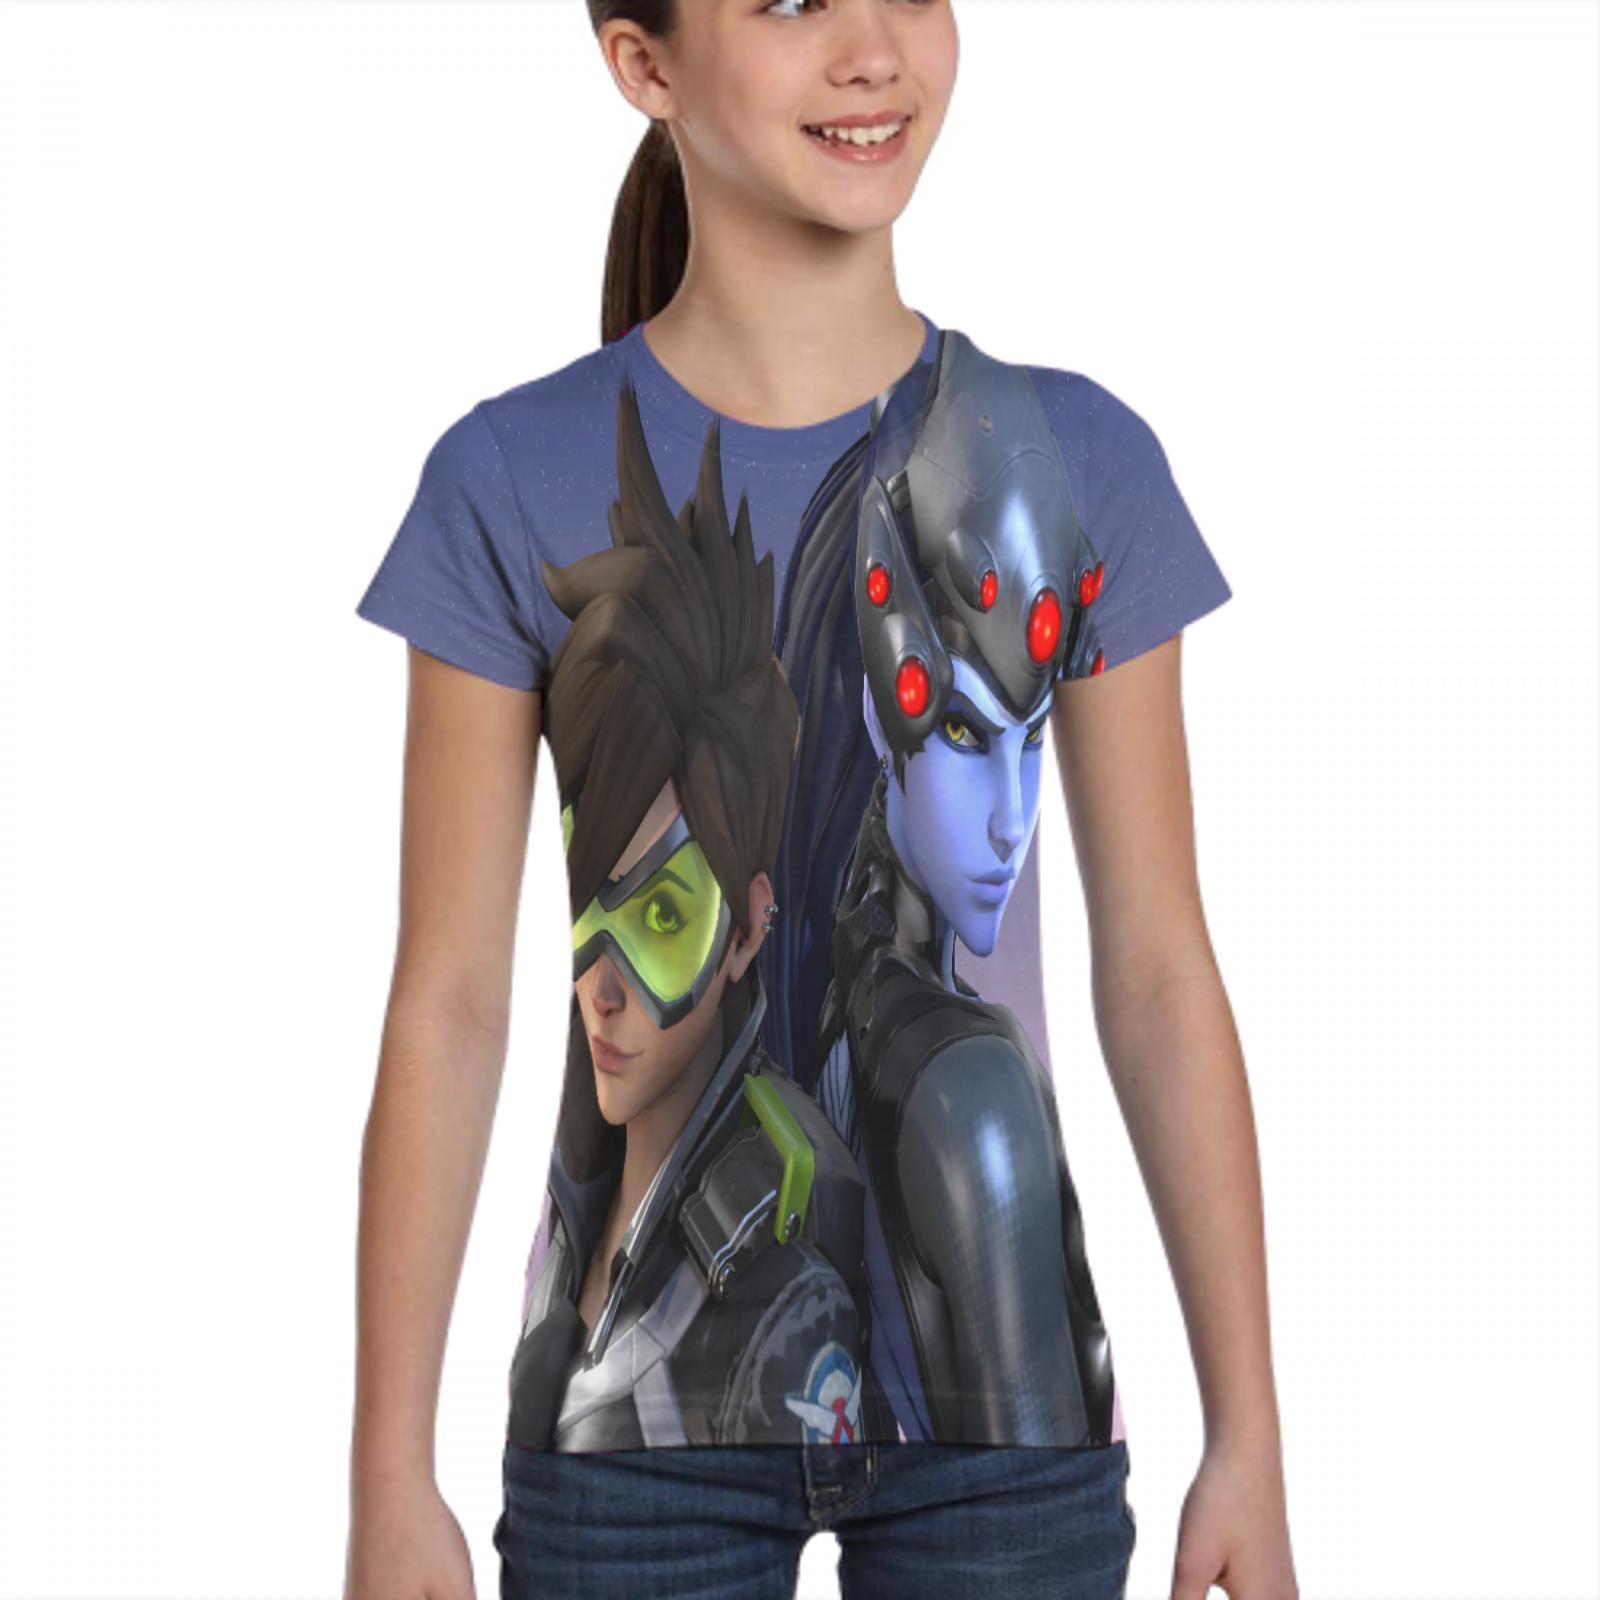 printer overwatch top t shirt gothic female/male black t shirt overwatch socks female/male t shirt 2